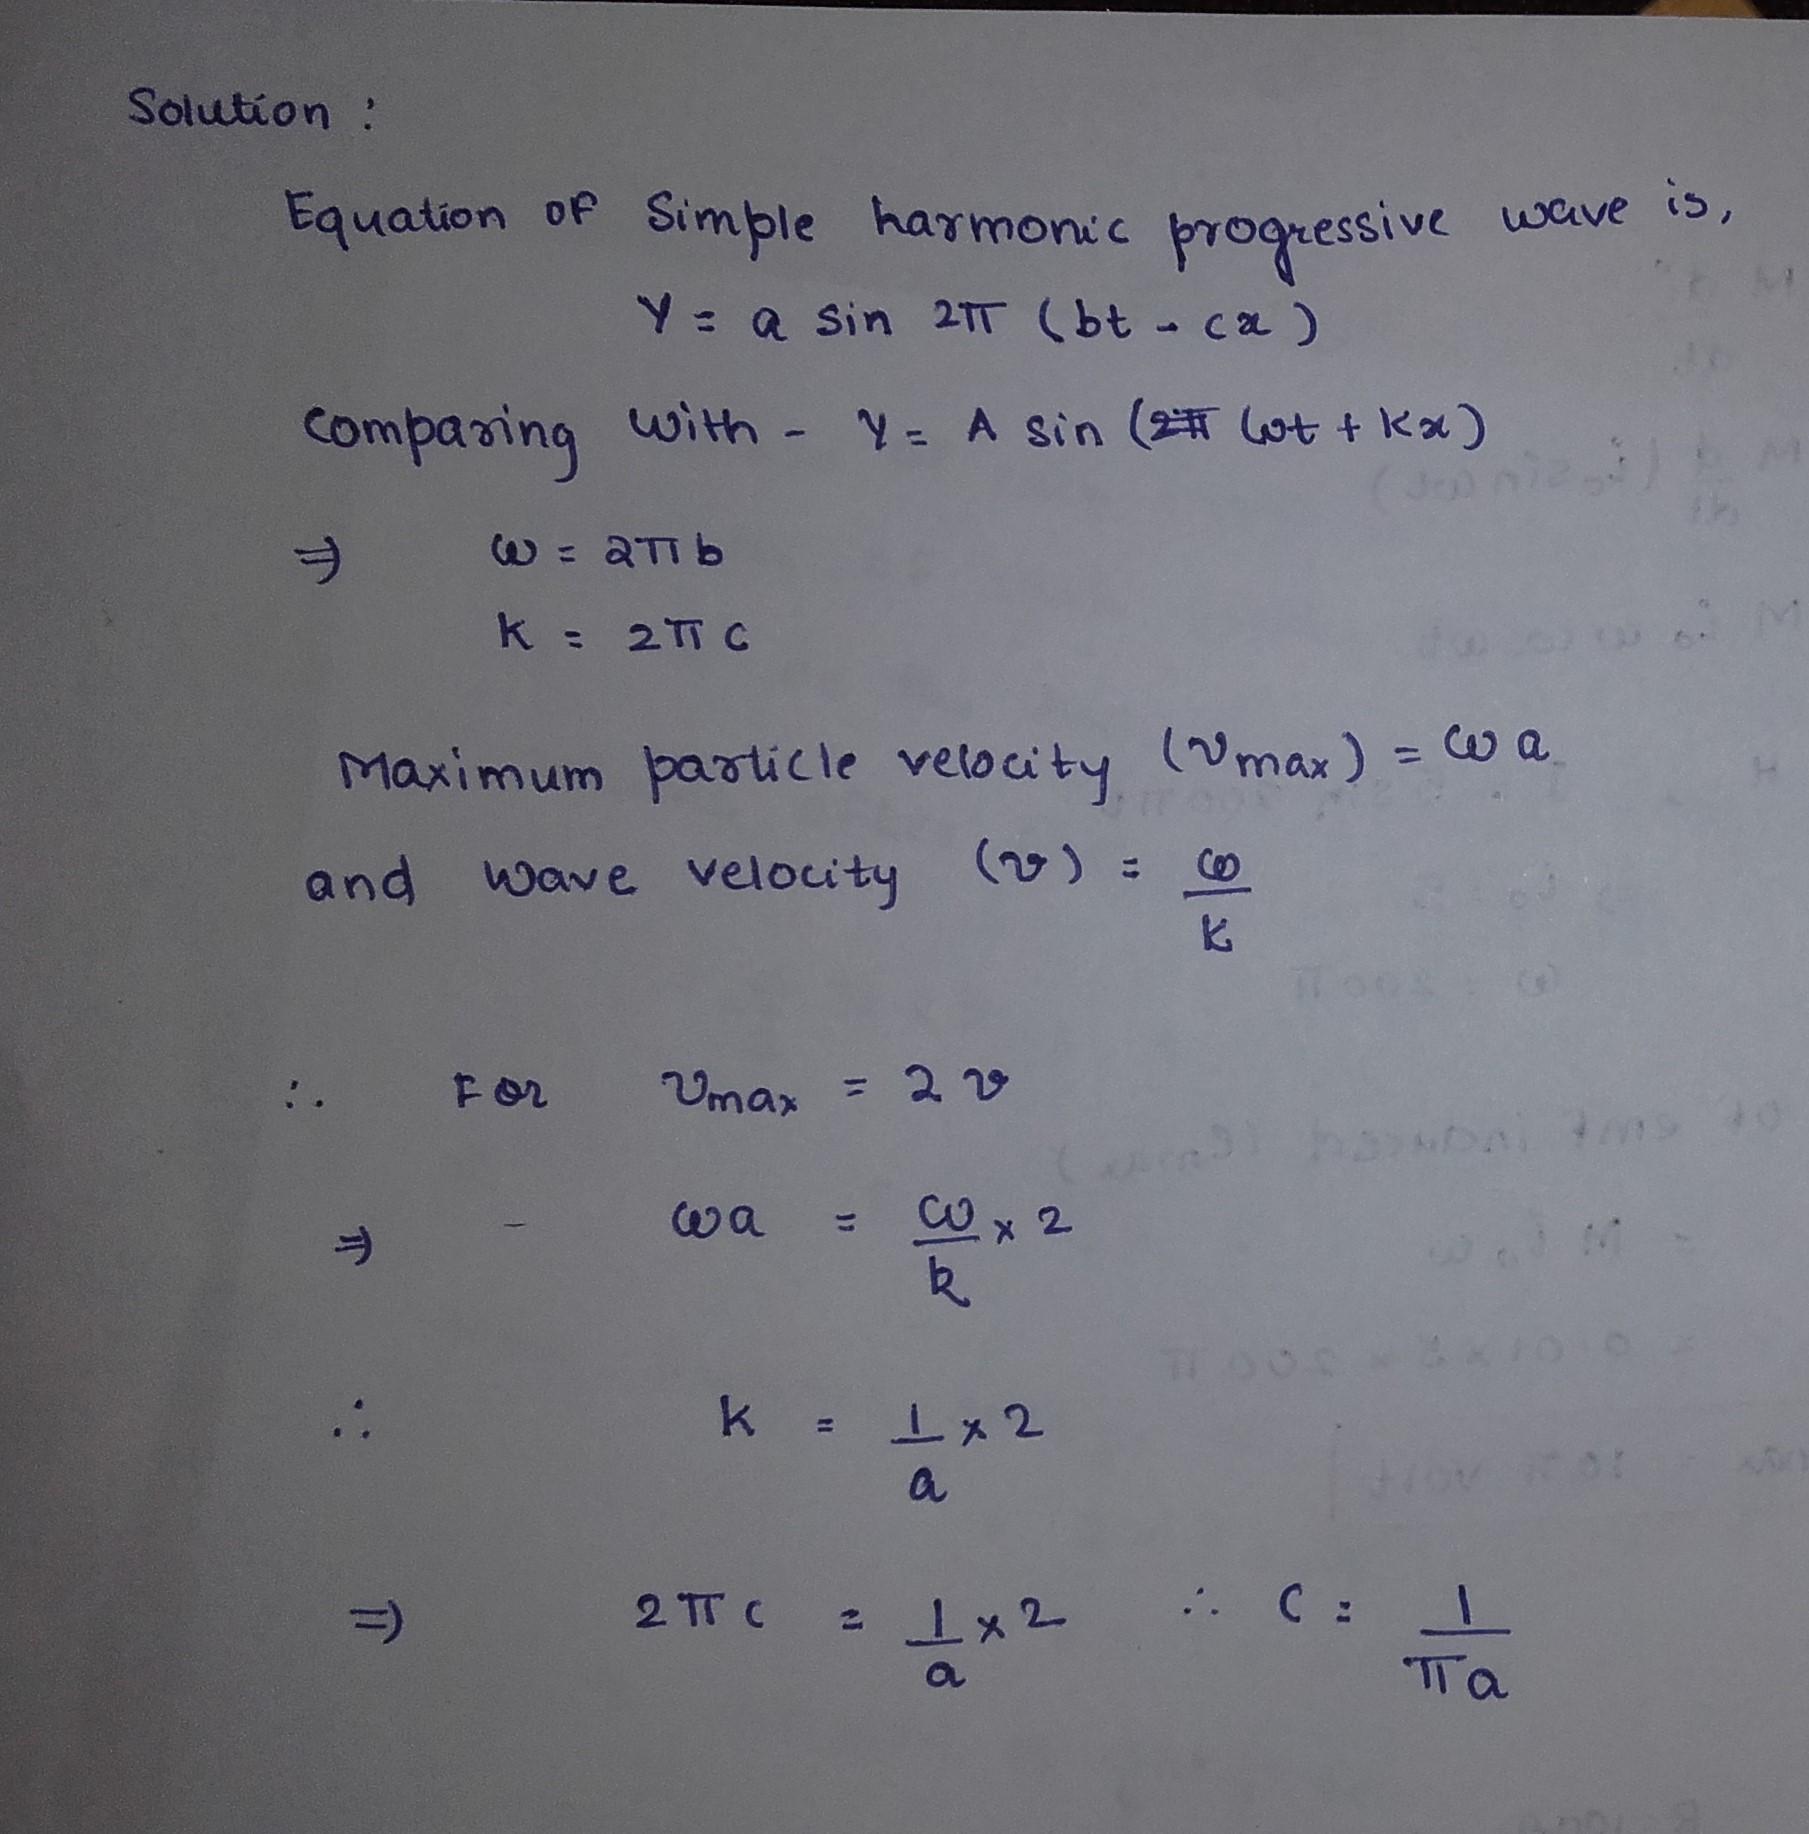 The equation of simple harmonic progressive wave i toppr.com